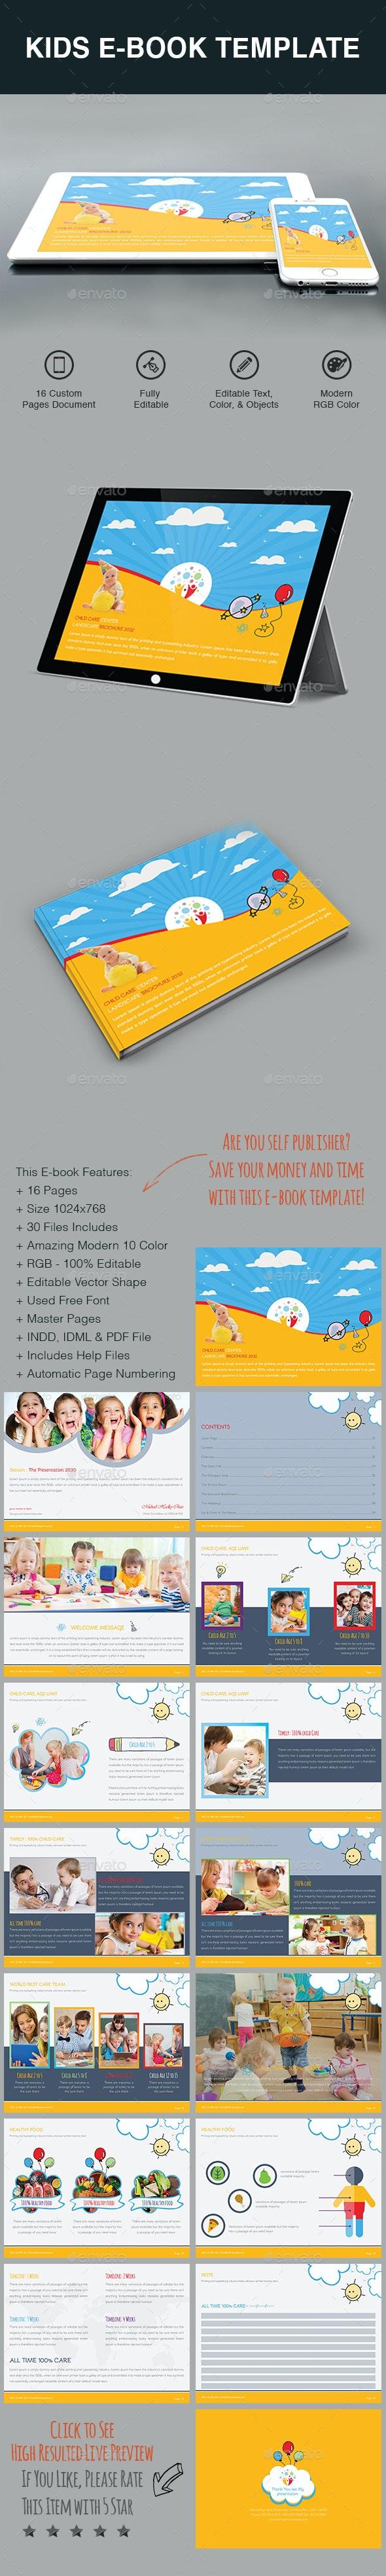 Kids E-Book - ePublishing